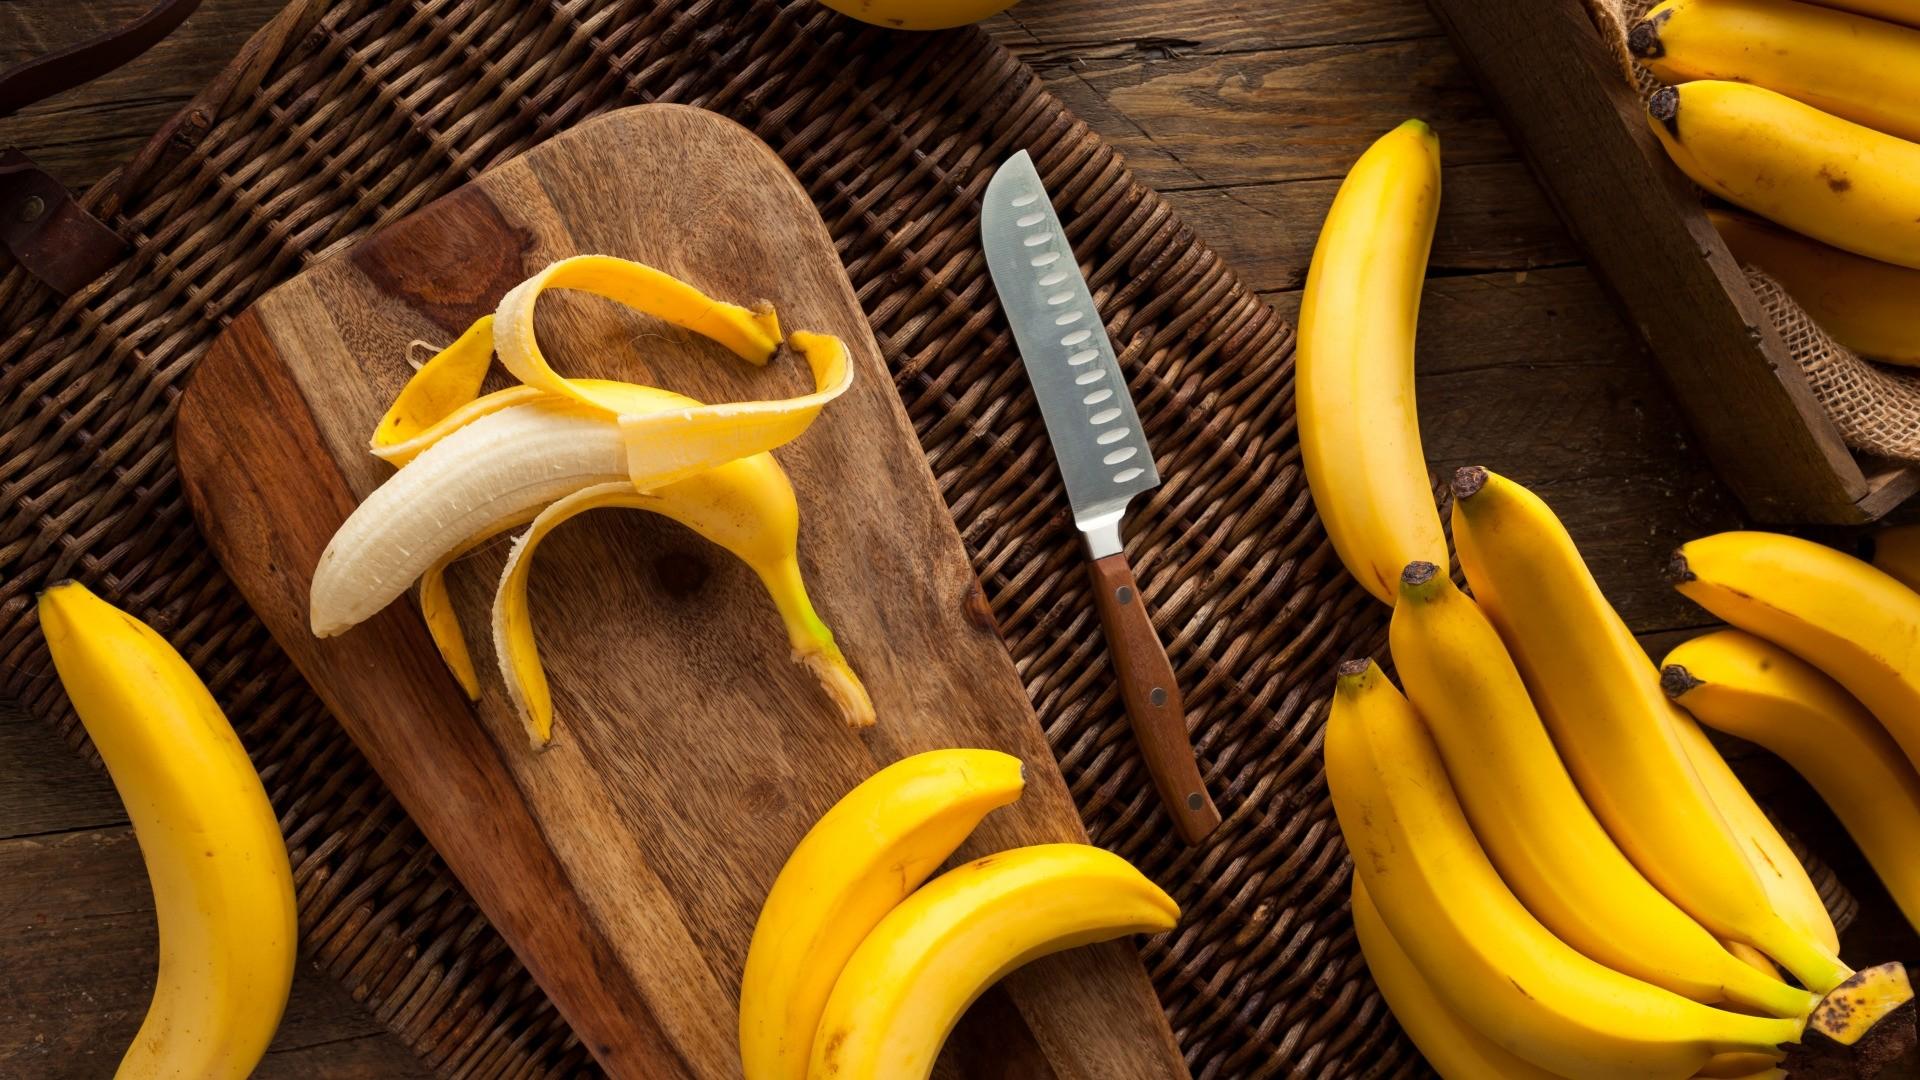 Banana hd desktop wallpaper